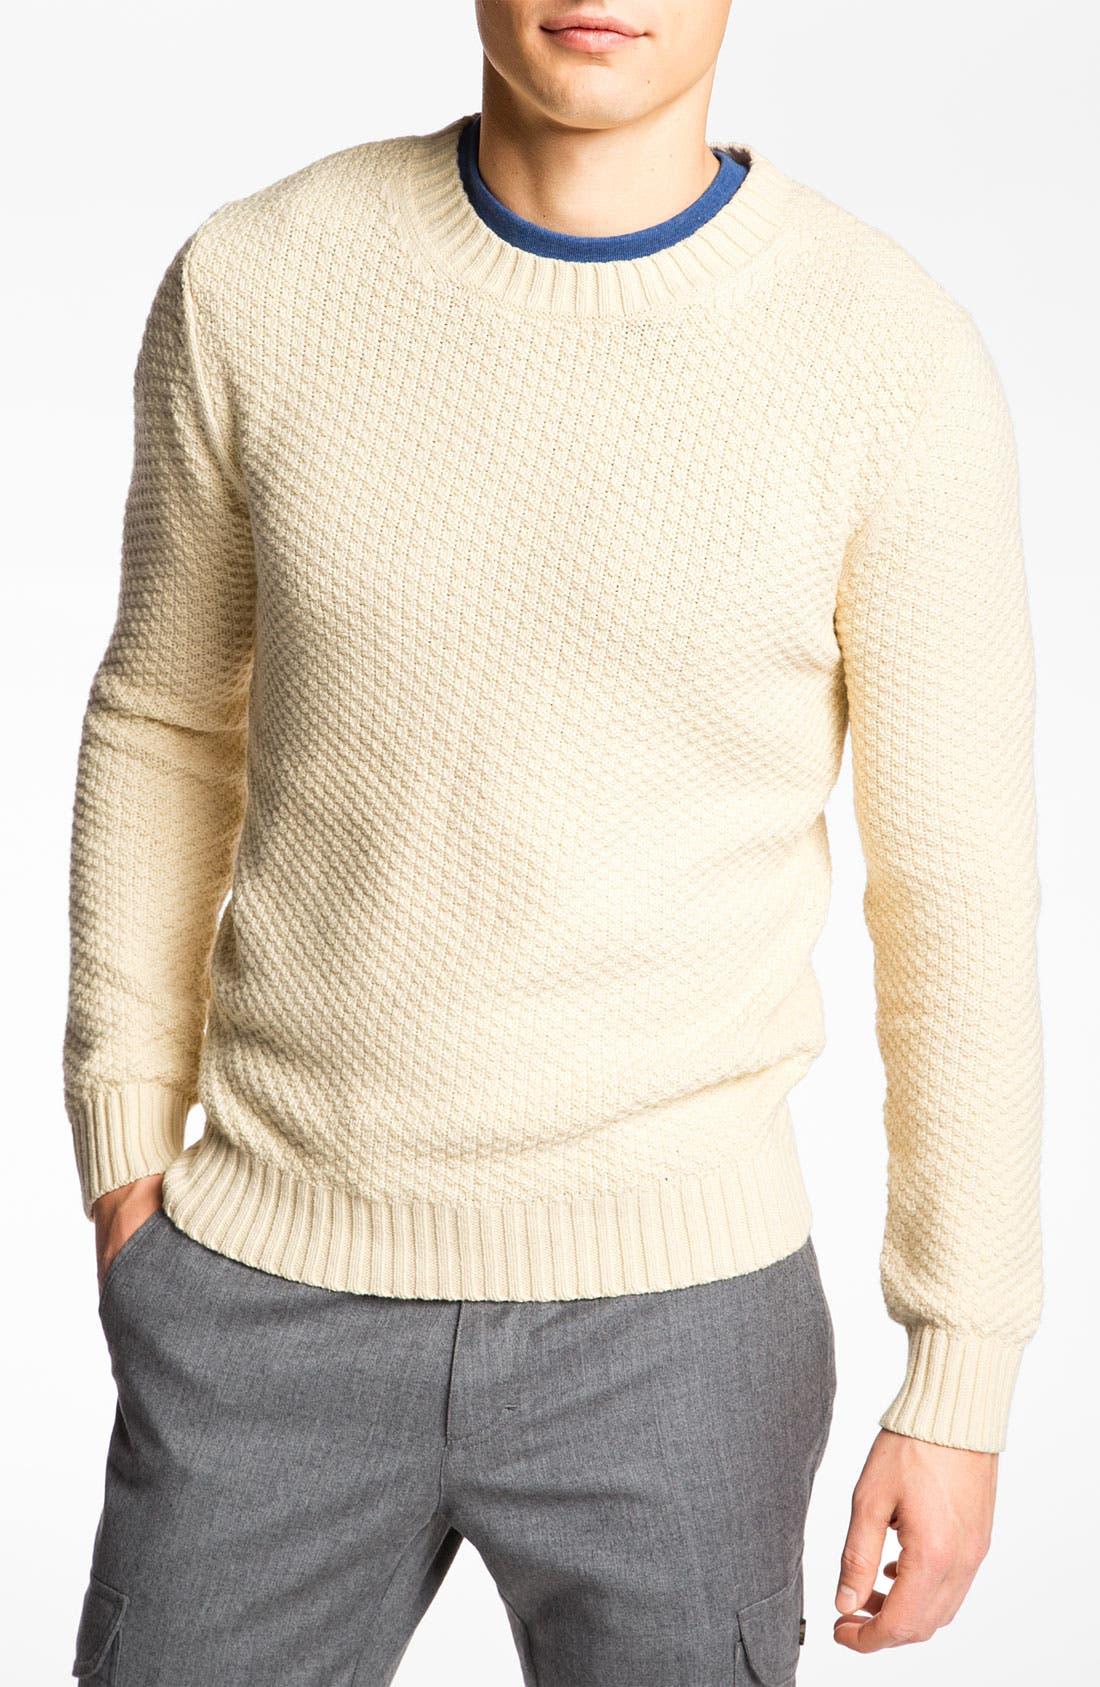 Main Image - Gant Rugger 'Pineapple Knit' Sweater